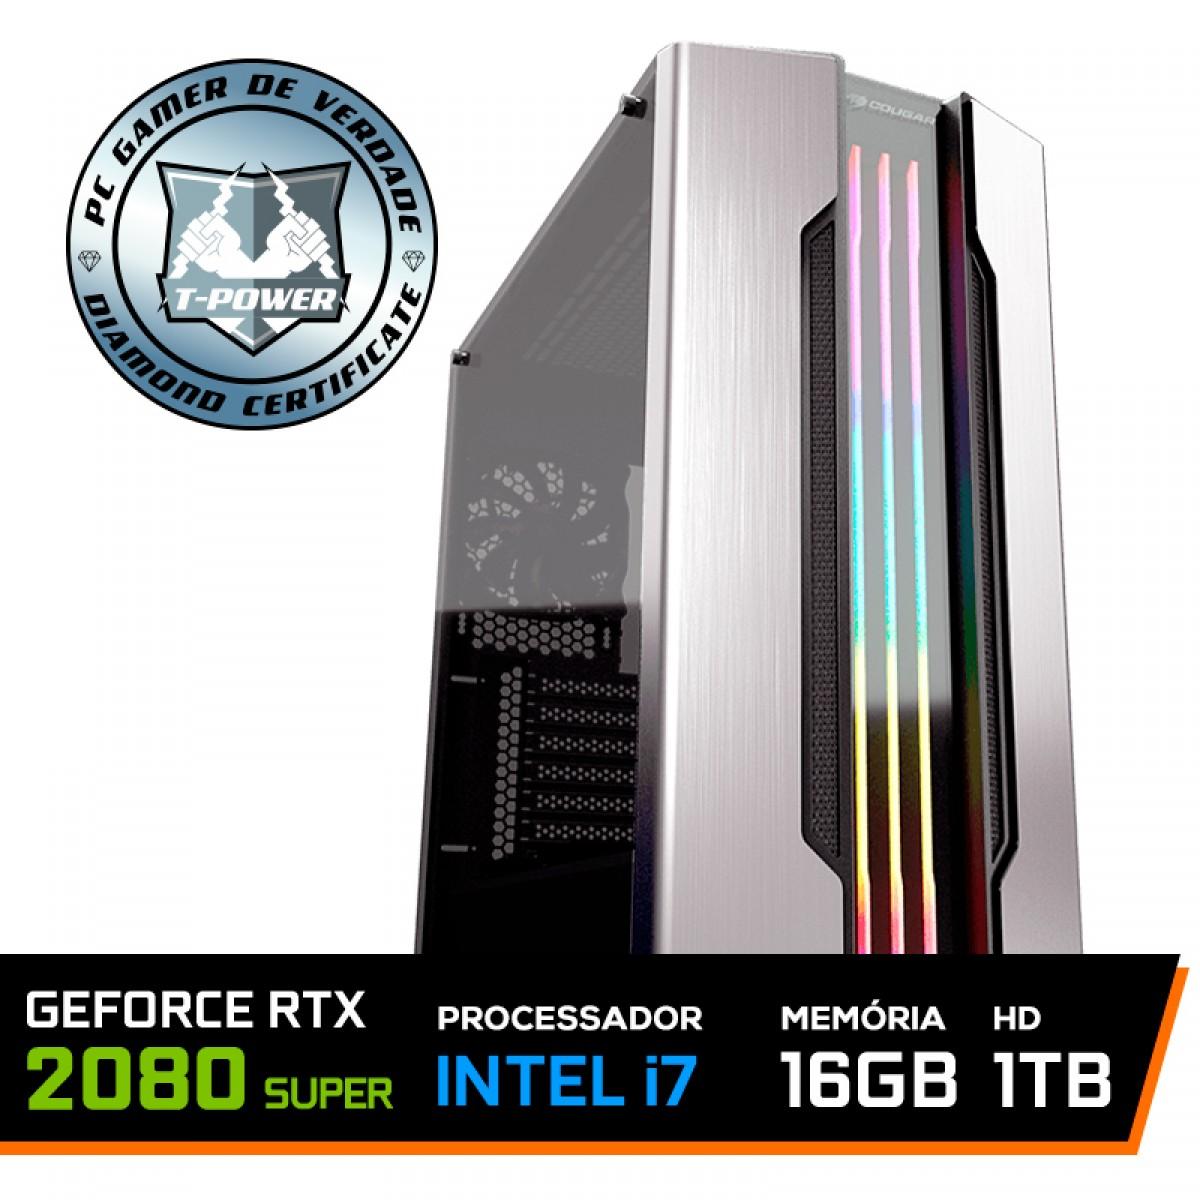 PC Gamer T-Power Captain Lvl-5 Intel I7 9700K 3.60GHz / Geforce RTX 2080 Super / 16GB DDR4 / HD 1TB / 600W